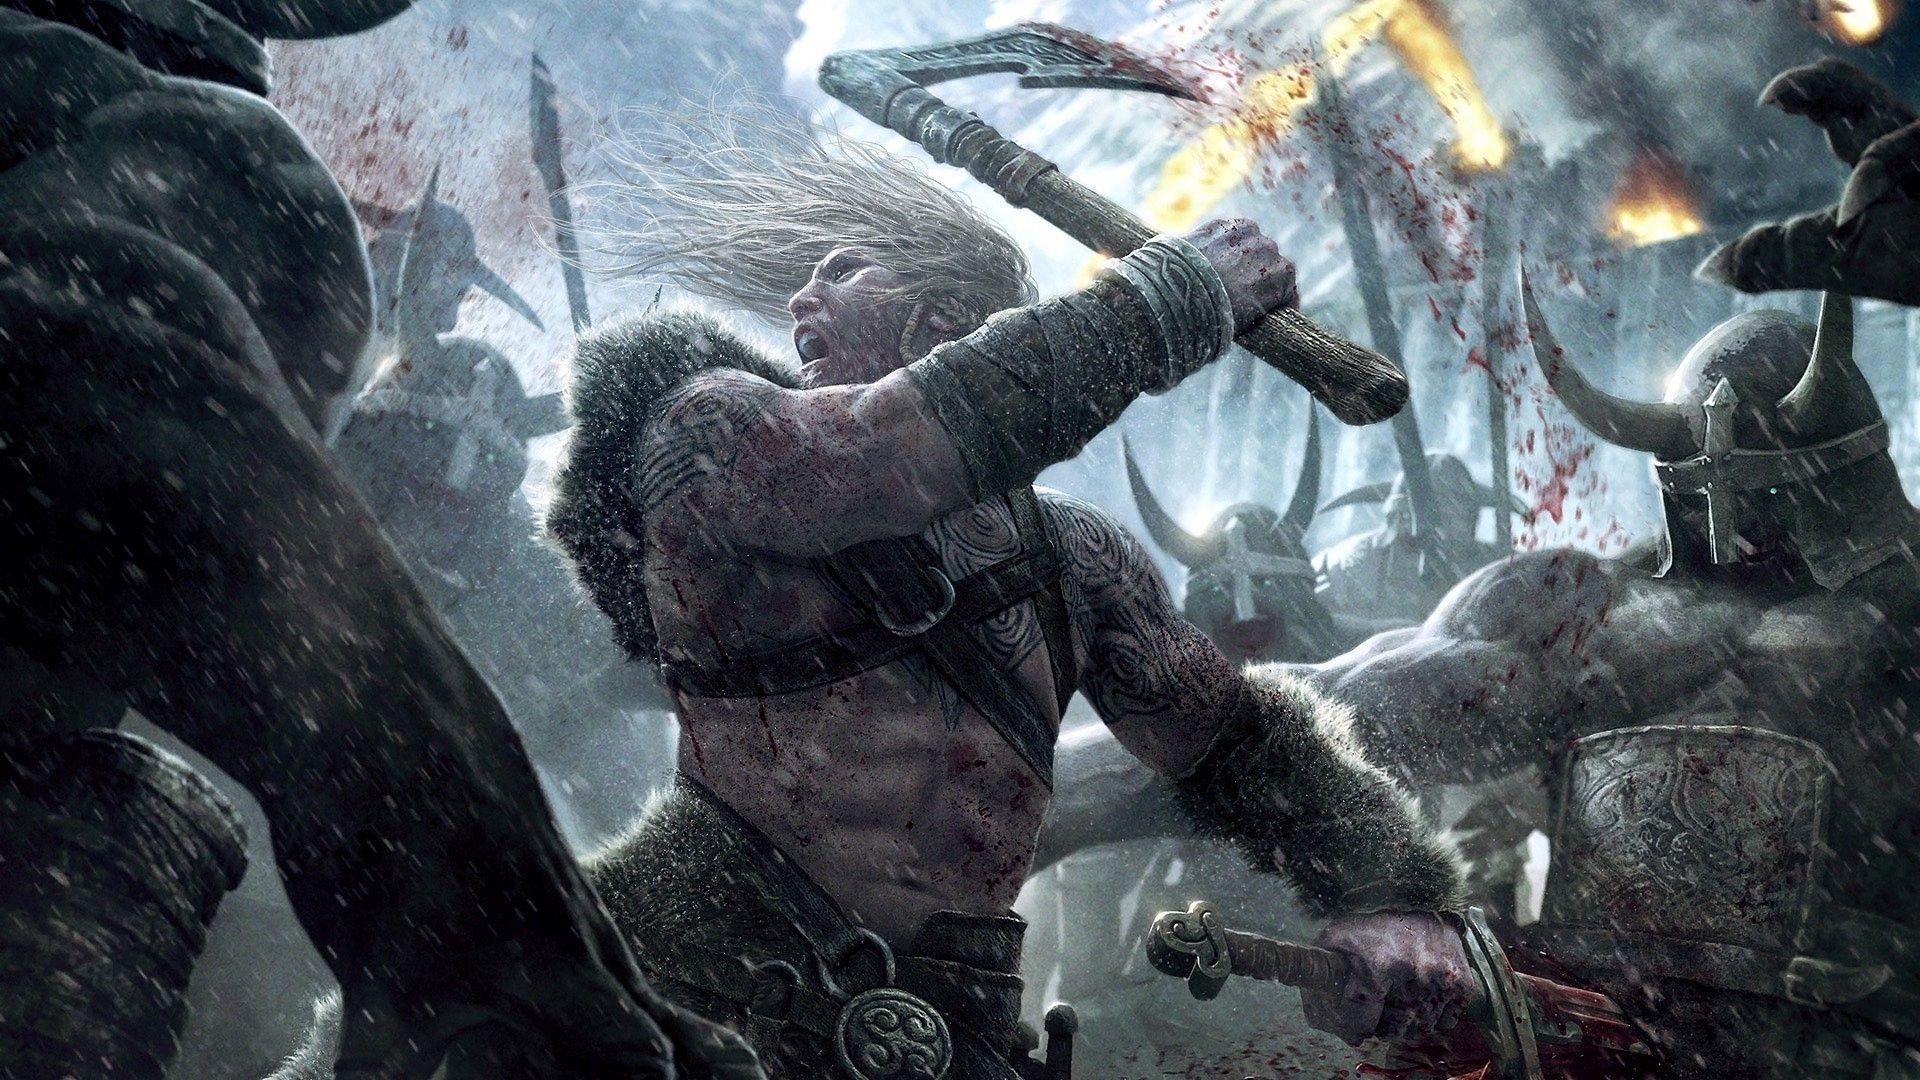 Viking, Battle for Asgard wallpaper – Free Wide HD Wallpaper